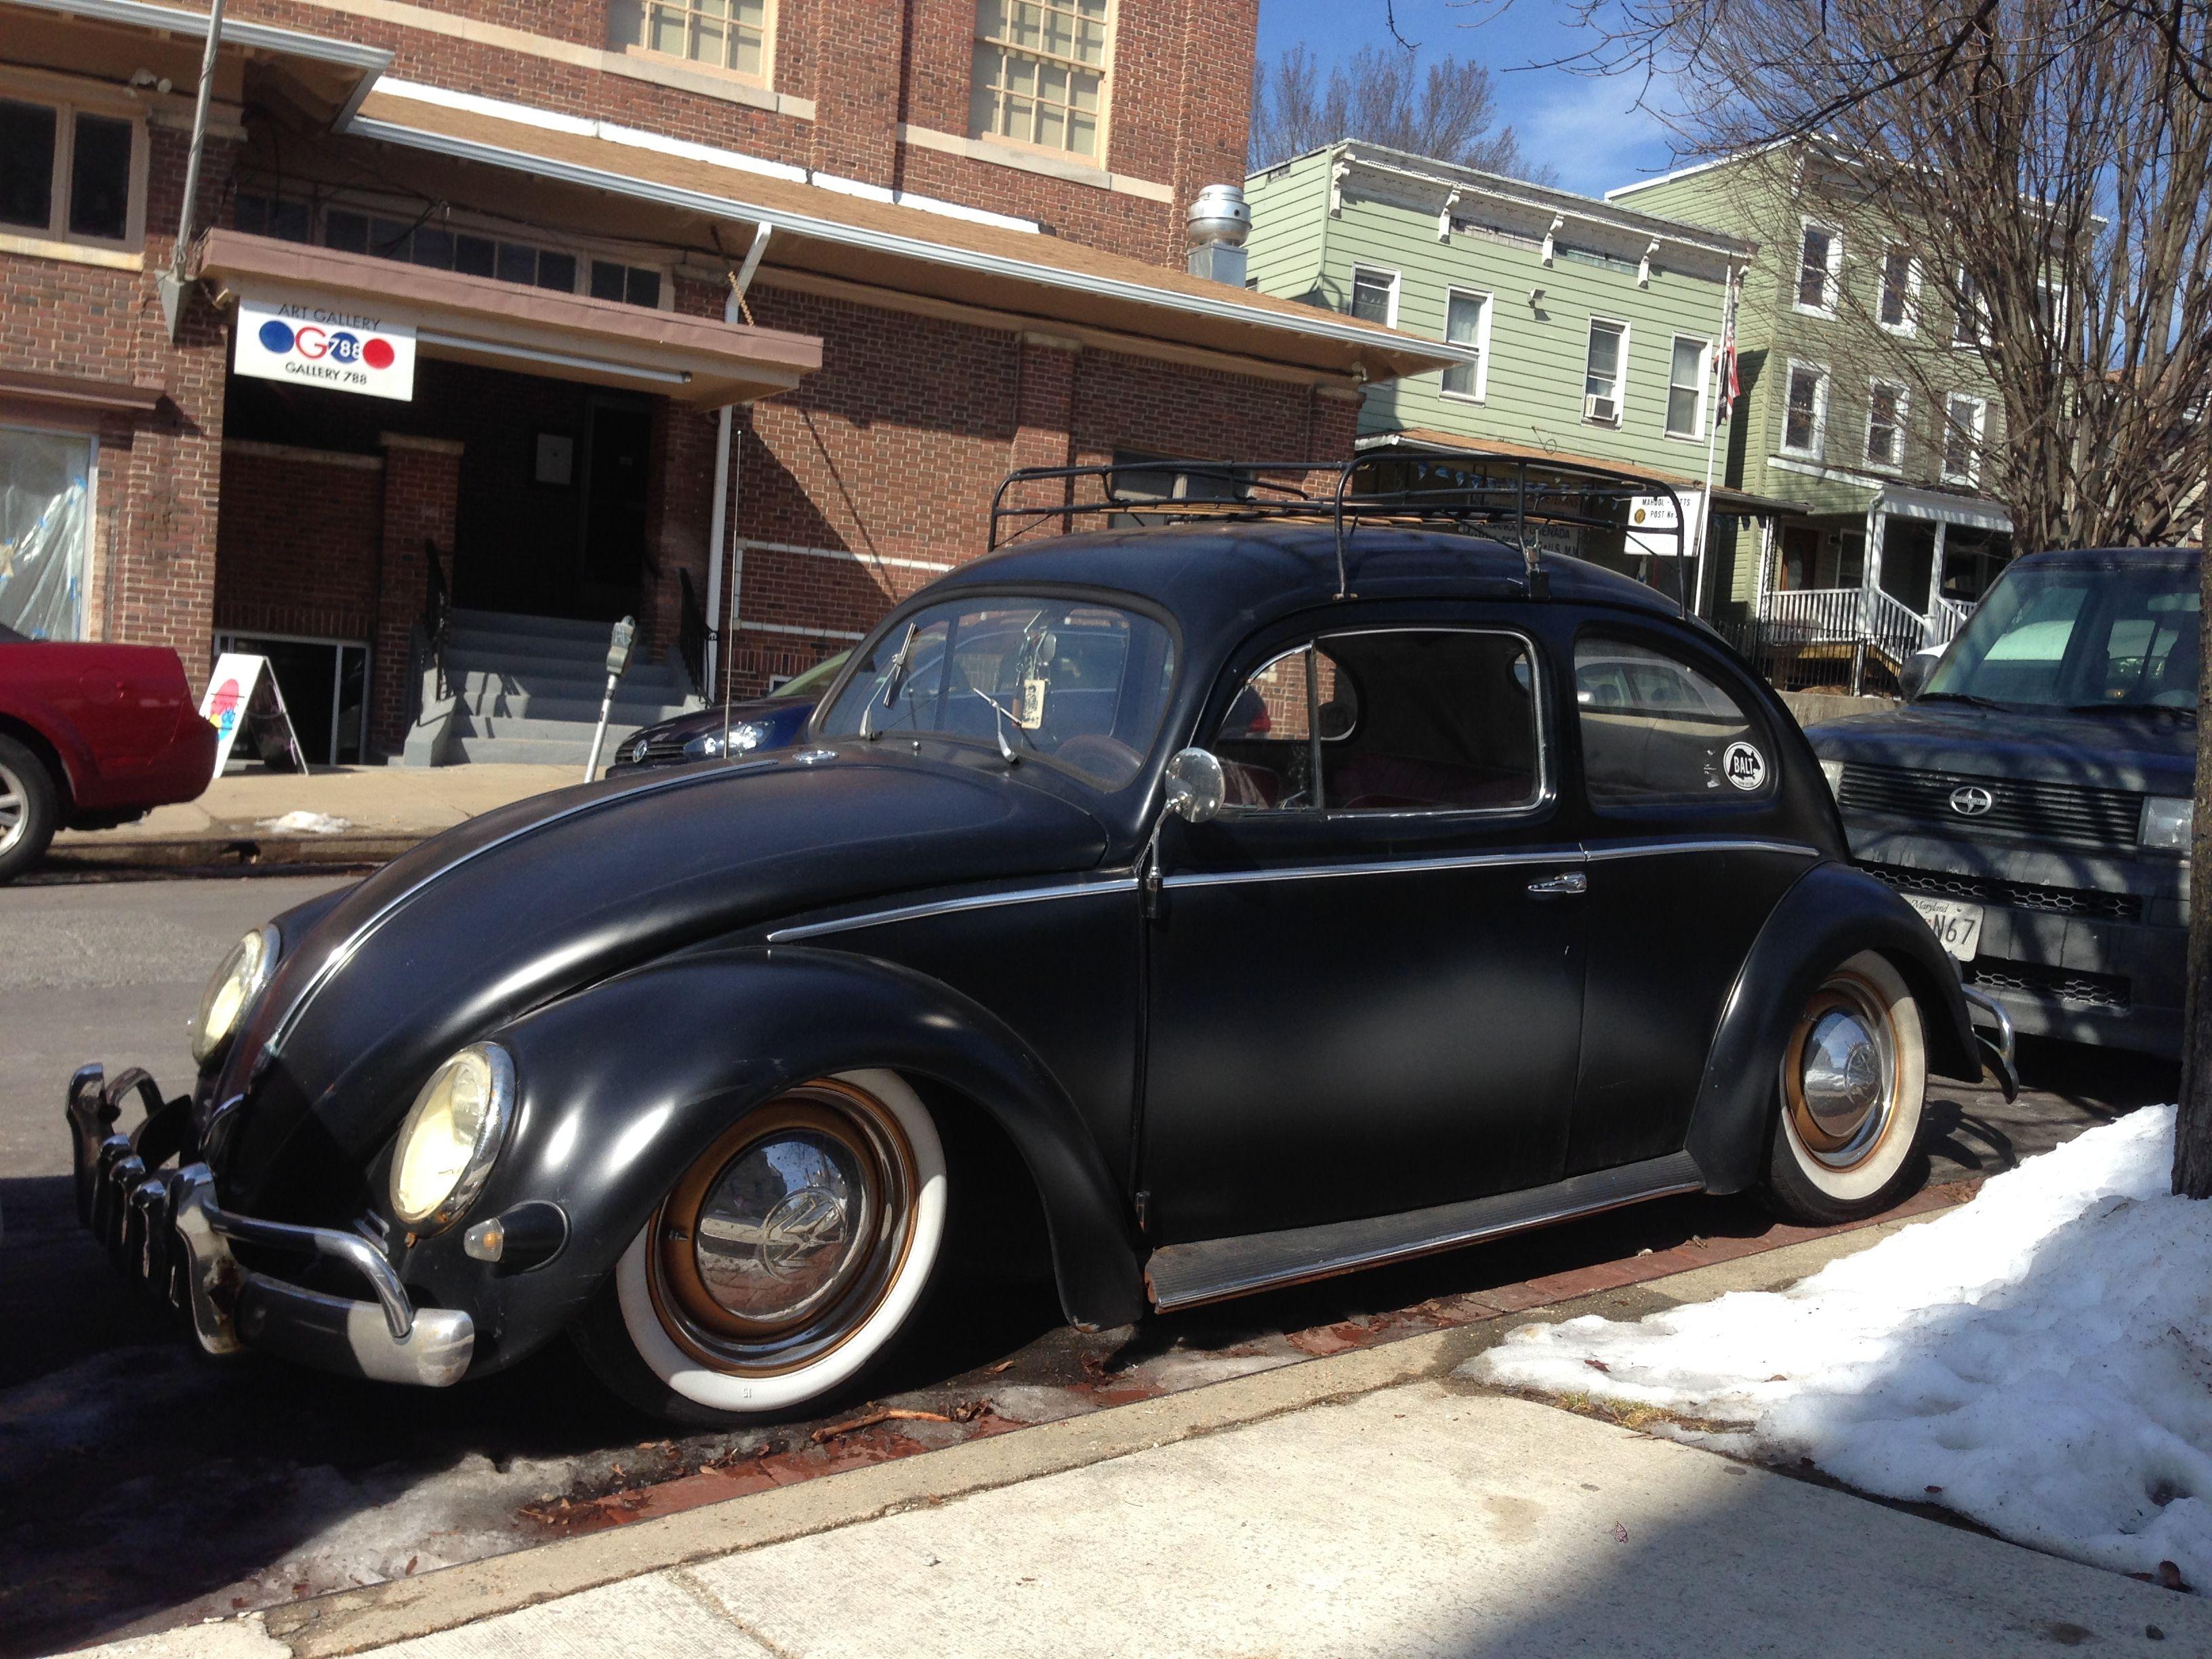 gallery imgur on sale craigslist for beetle volkswagen album new ragtop